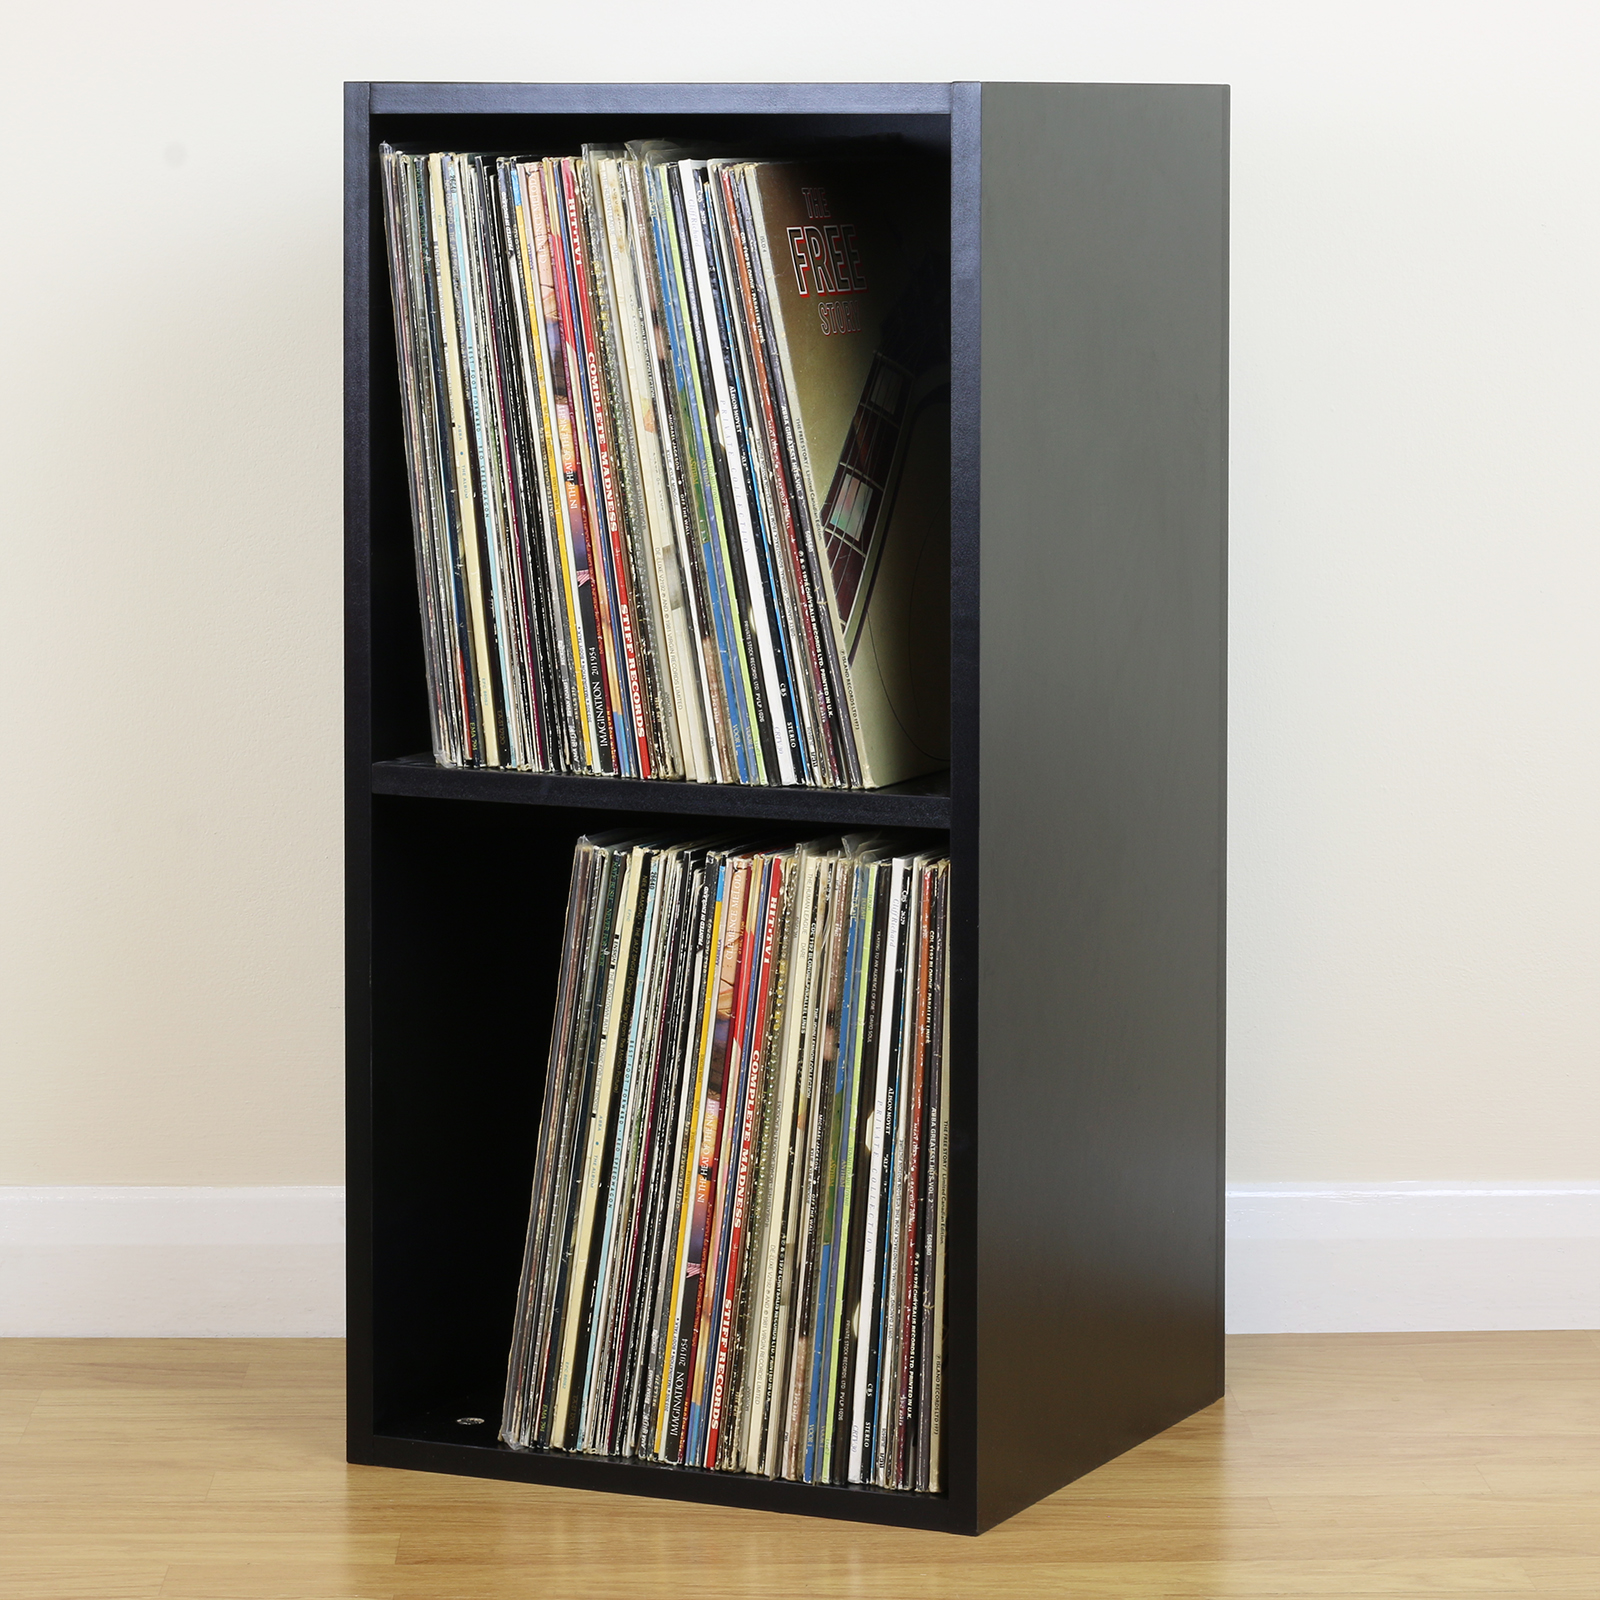 Sentinel Large Black Square LP/Vinyl Music Record Storage Cube/Cabinet Home  Display Unit